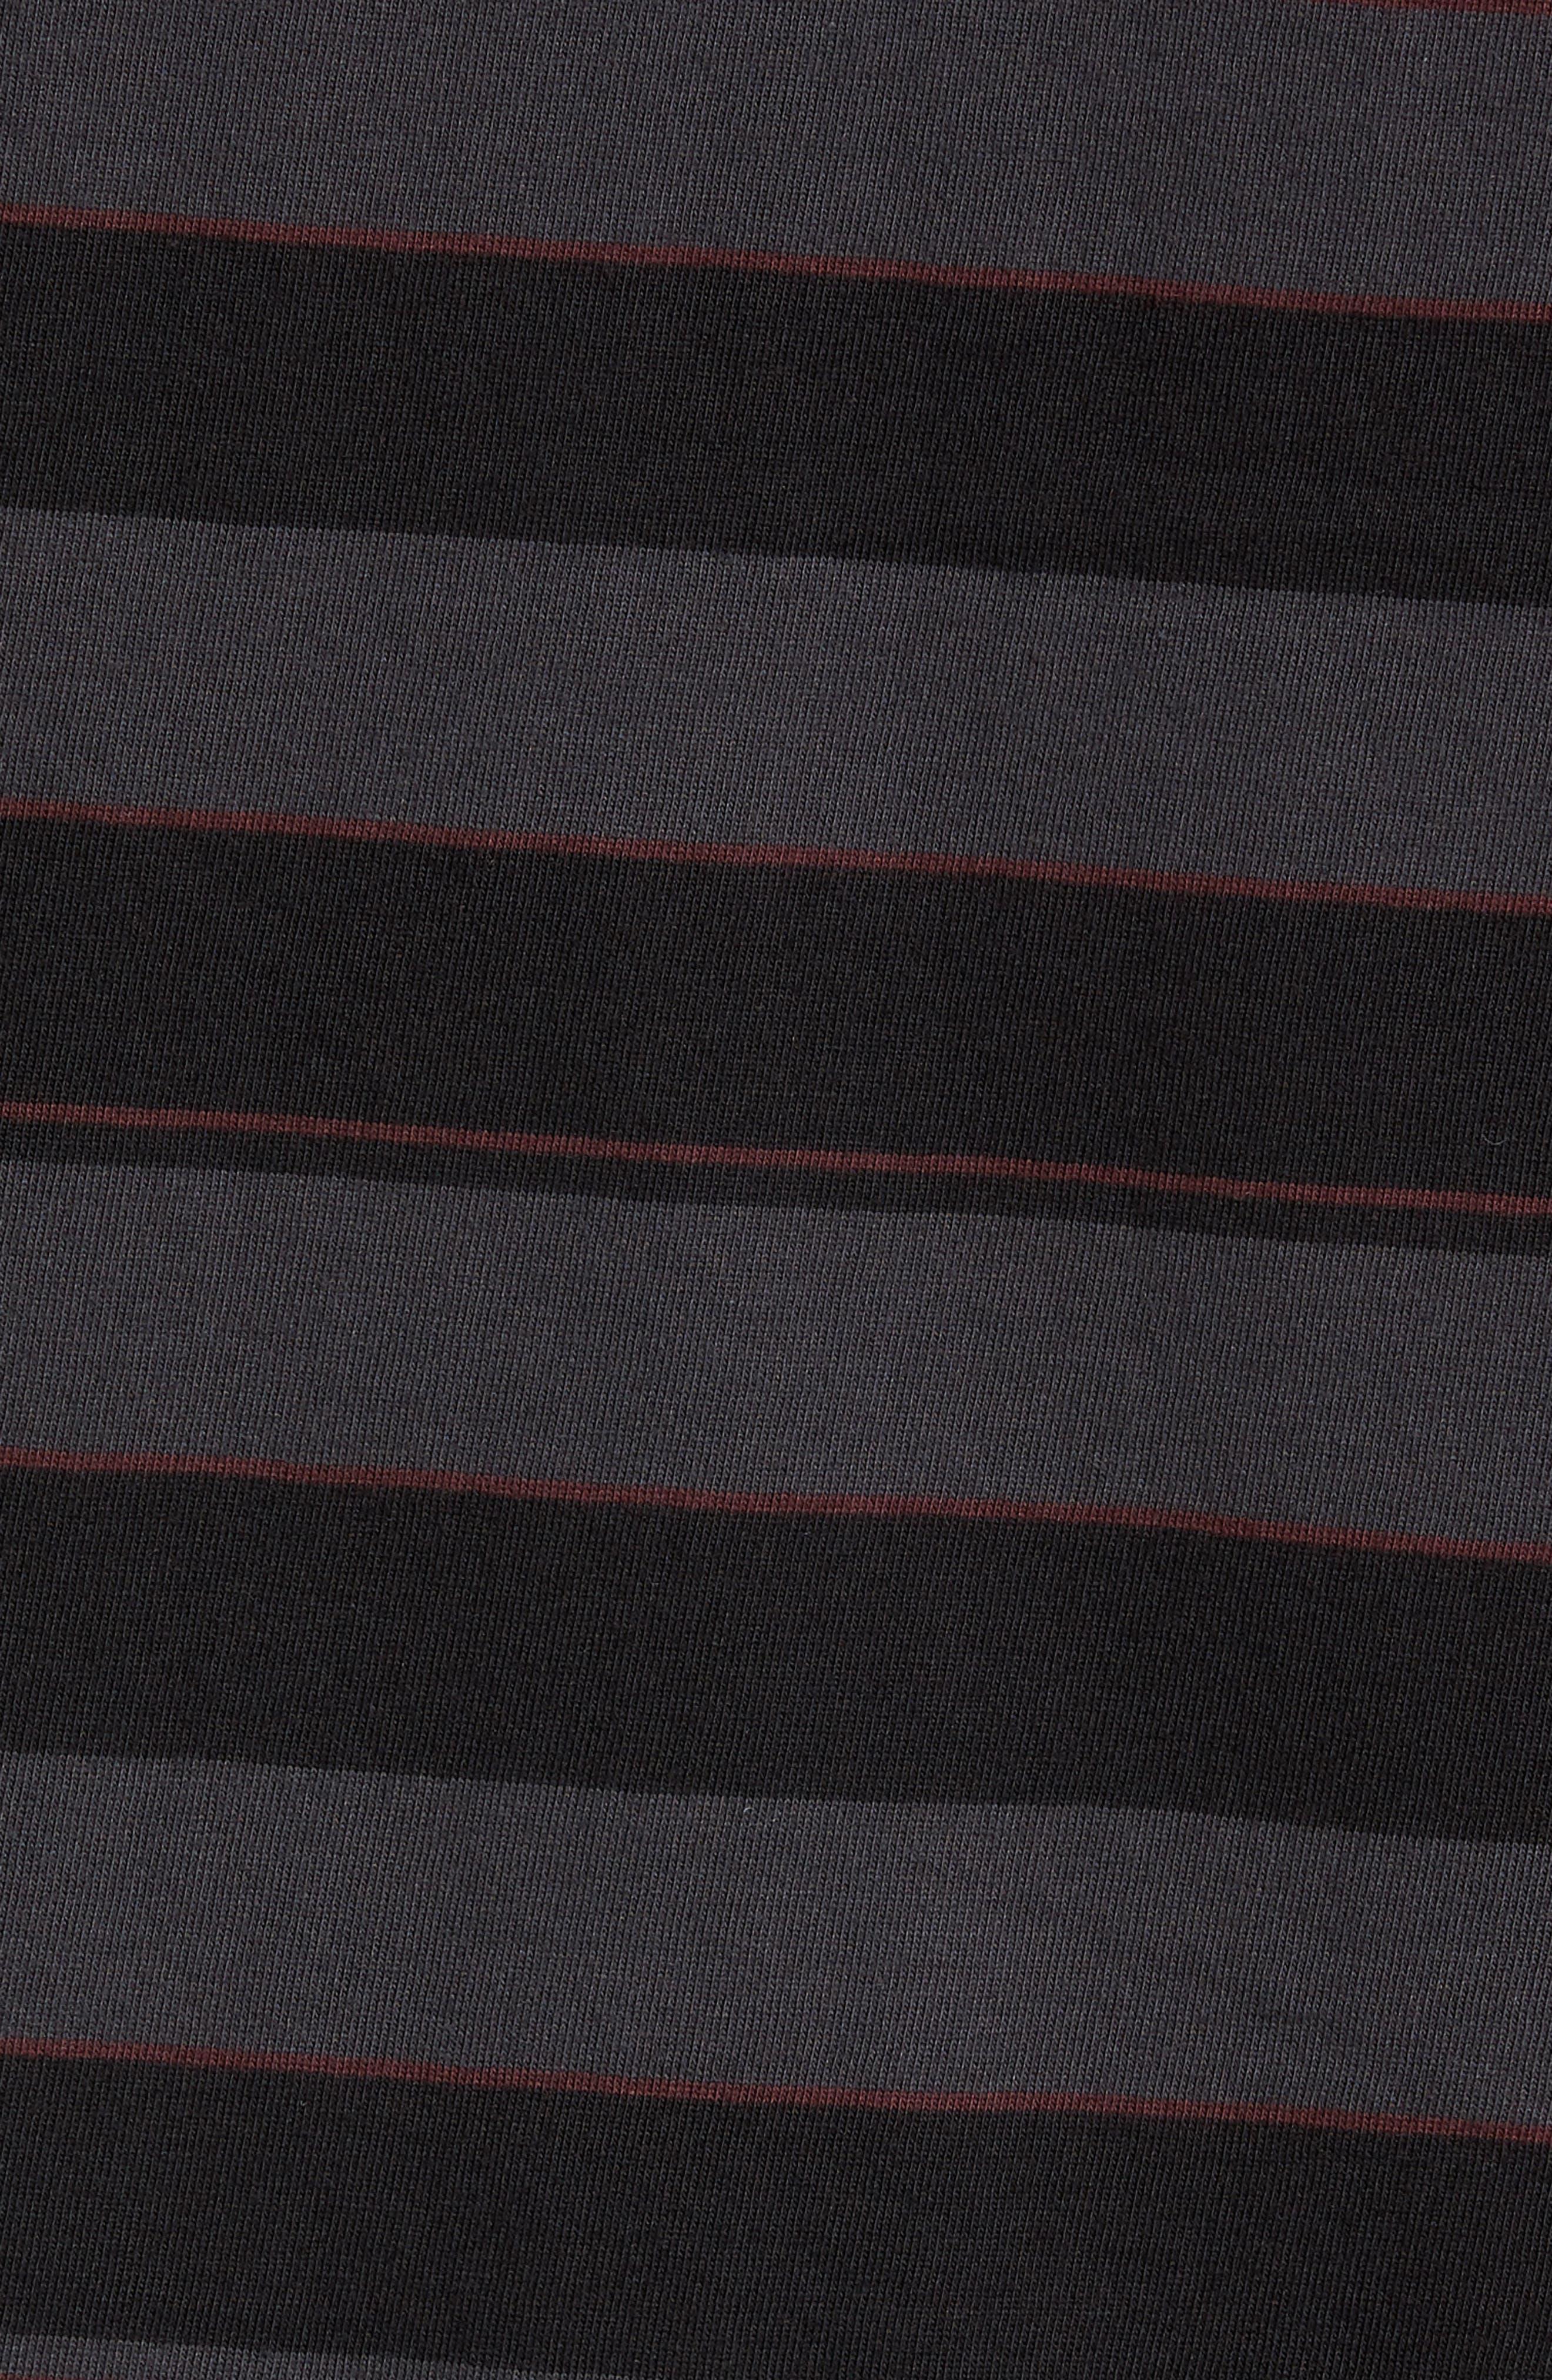 Hoop Box Long Sleeve T-Shirt,                             Alternate thumbnail 5, color,                             VINTAGE BLACK/ BLACK